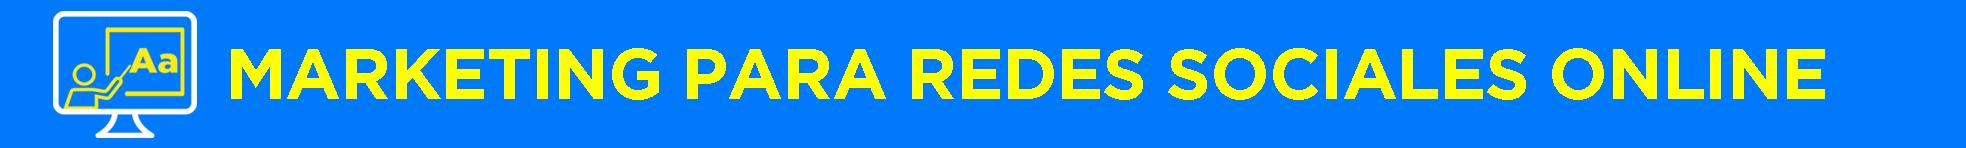 Banner título Marketing Online